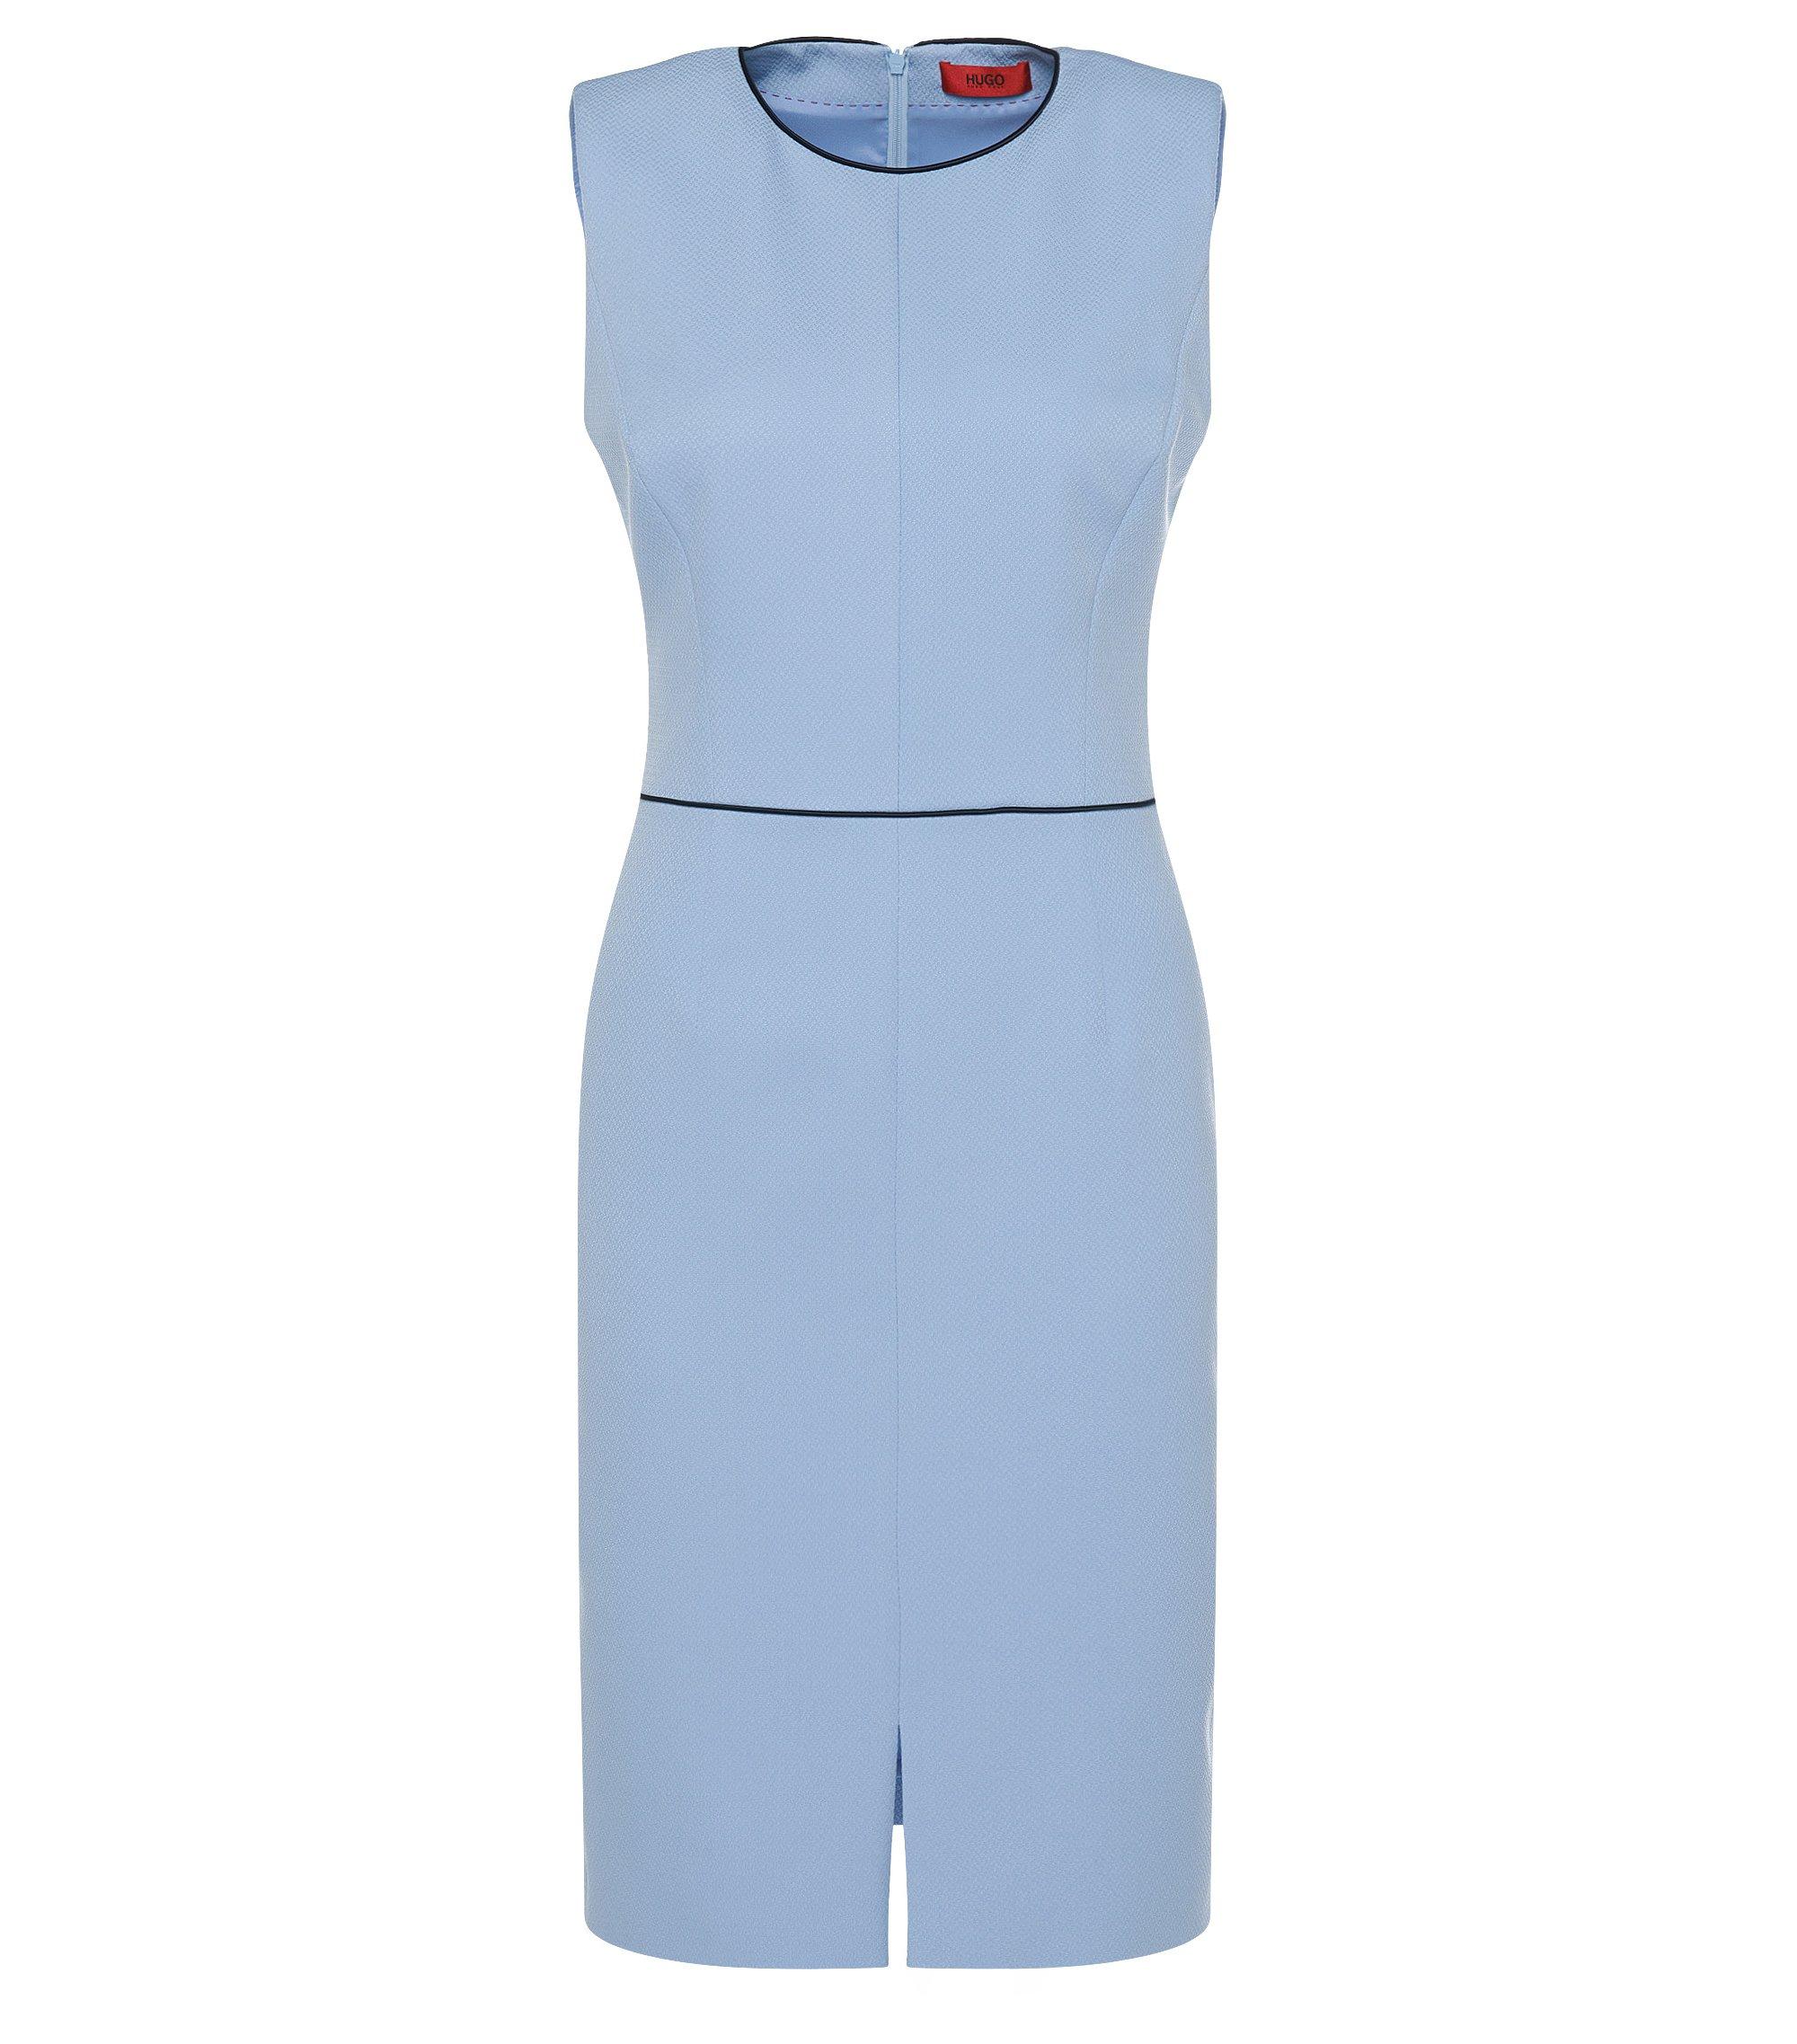 Textured Sheath Dress | Klenni, Light Blue